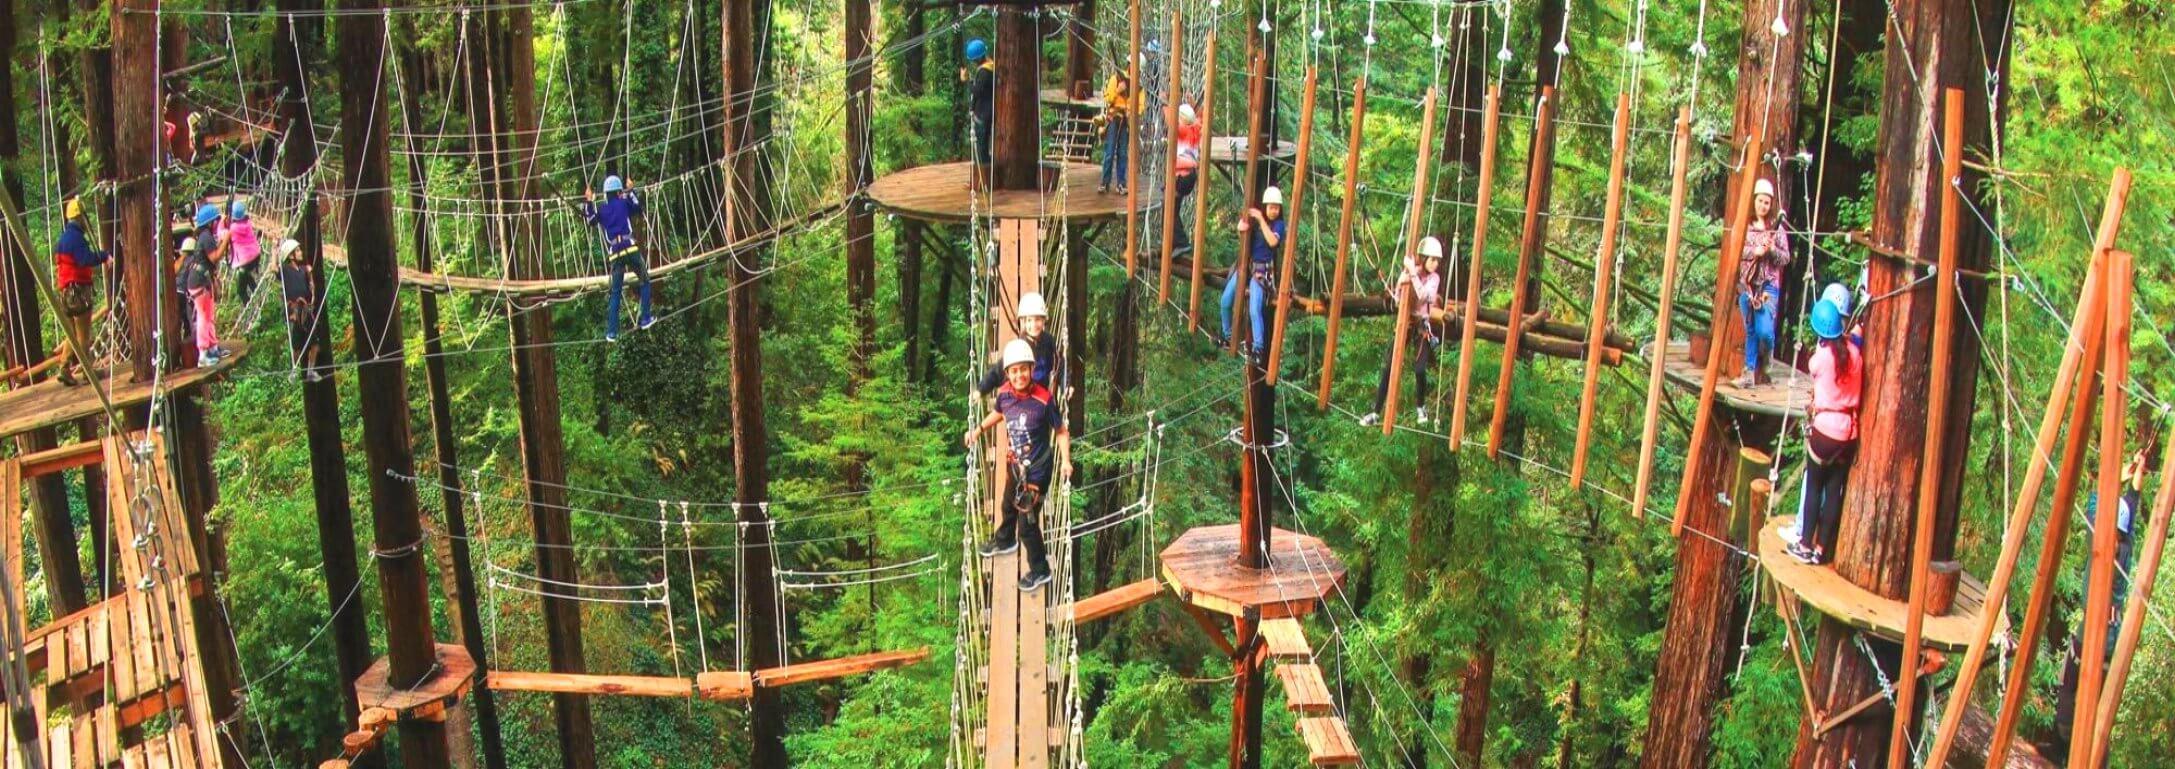 redwoods-canopy-tours-and-zipline-adventure-giant-rredwoods